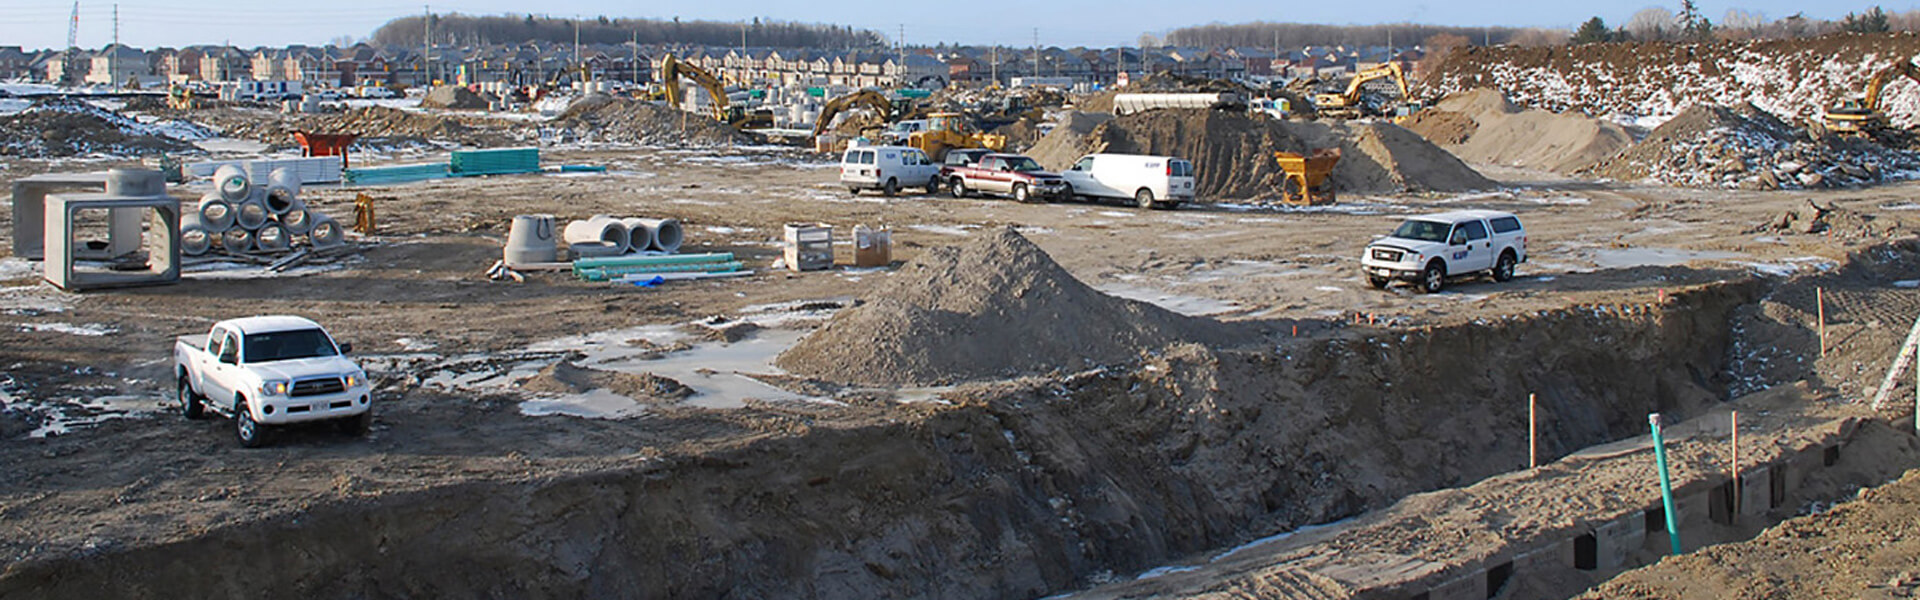 Project Management Civil Engineering_Toronoto Construction Management Services